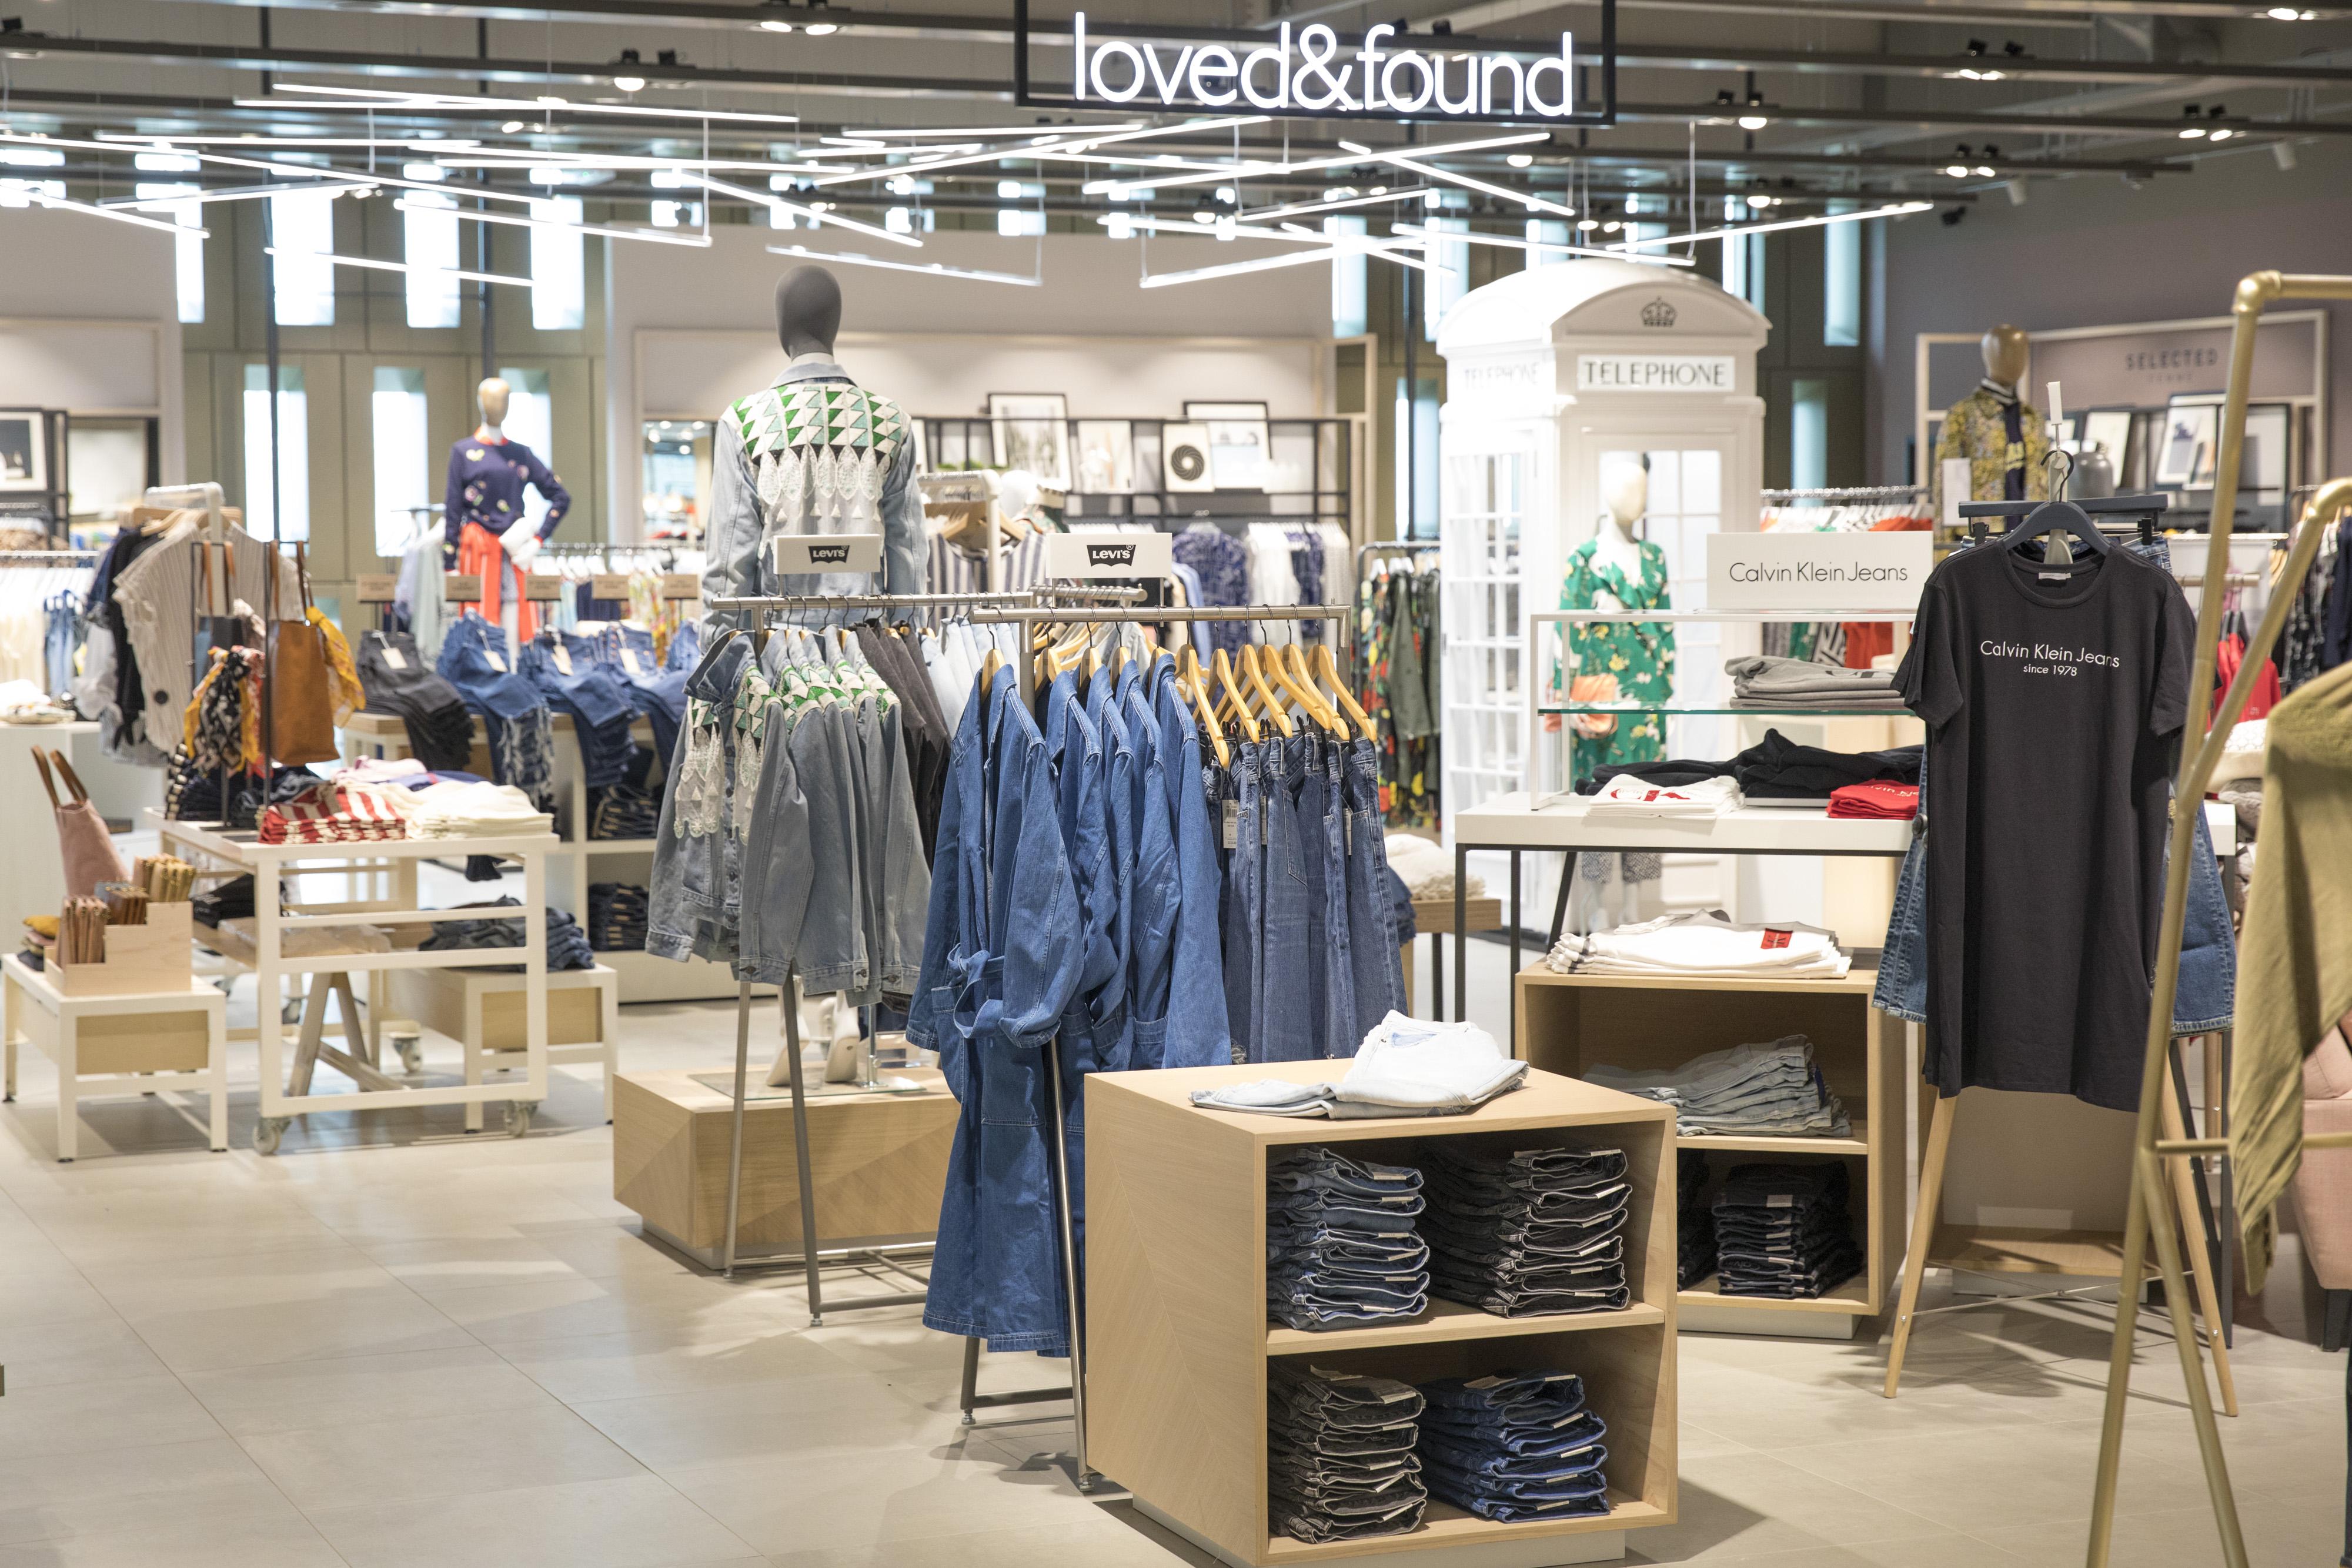 John Lewis, Westfield Shopping Centre, White City, London, U.K. Wednesday, March 14, 2018. Photographer: Jason Alden Photographer: Jason Aldenwww.jasonalden.com0781 063 1642